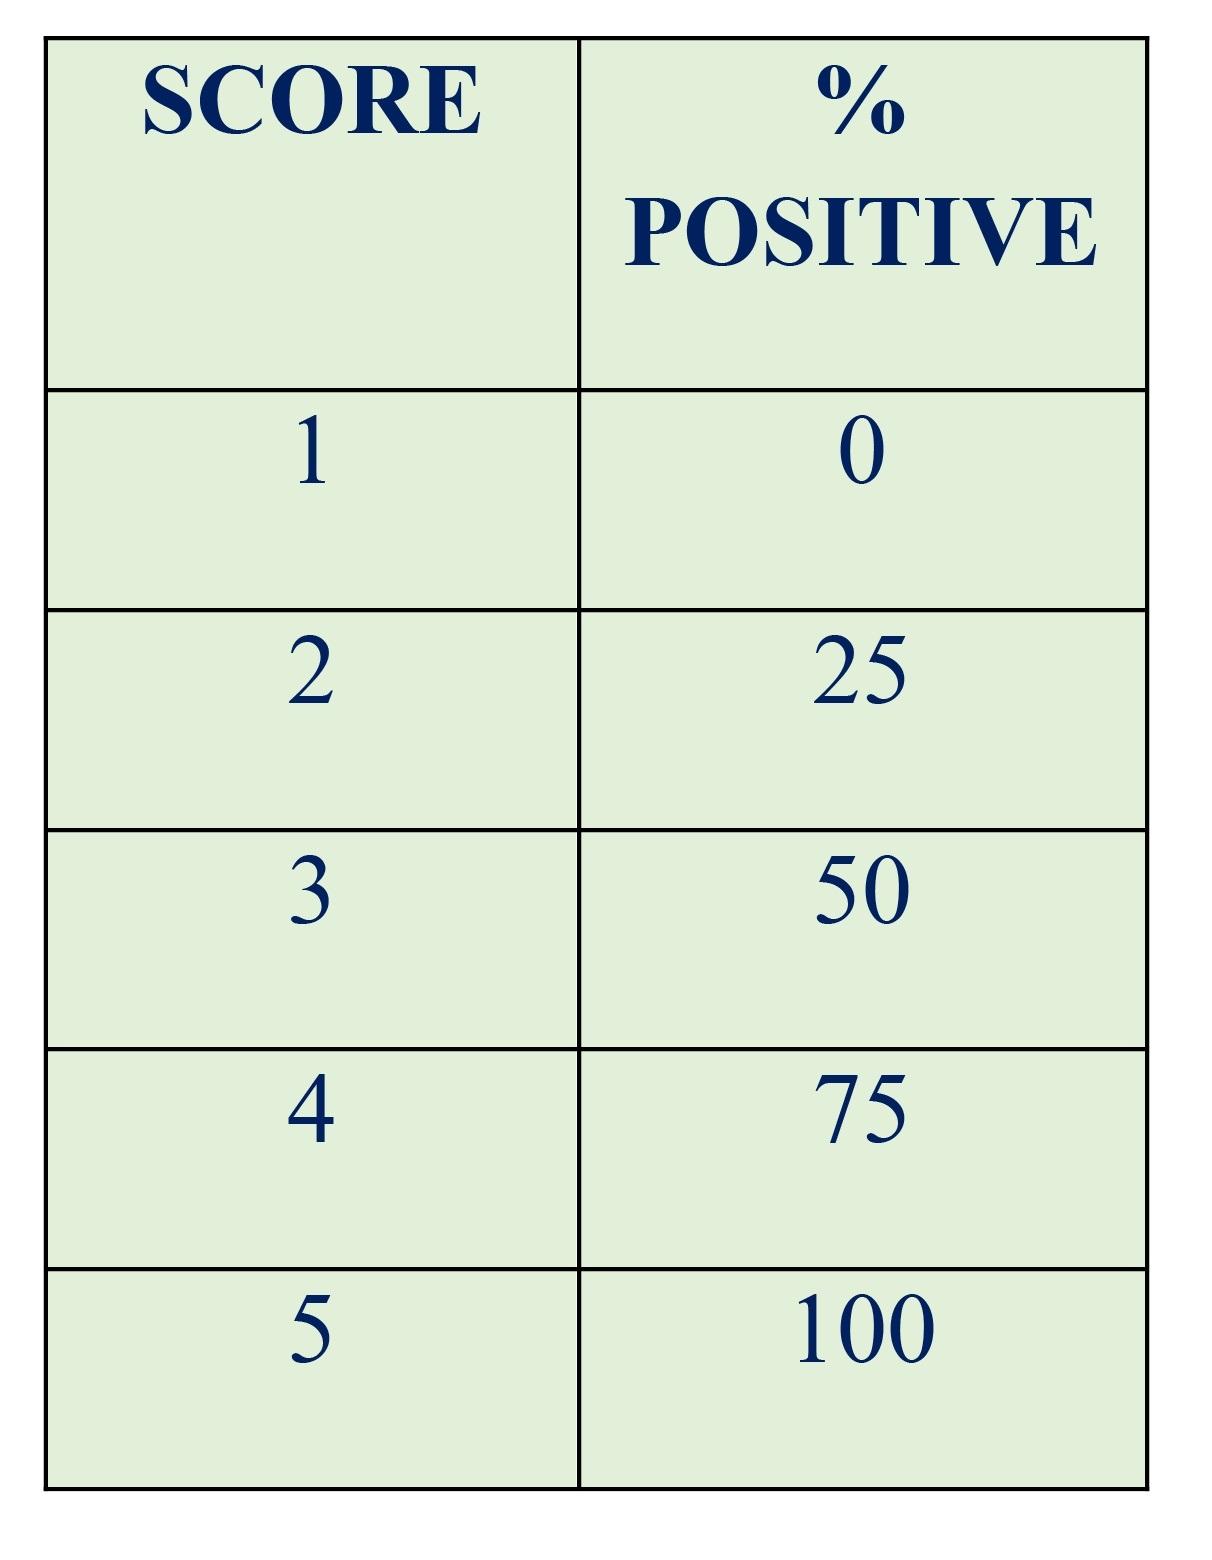 Percent positive scoring.